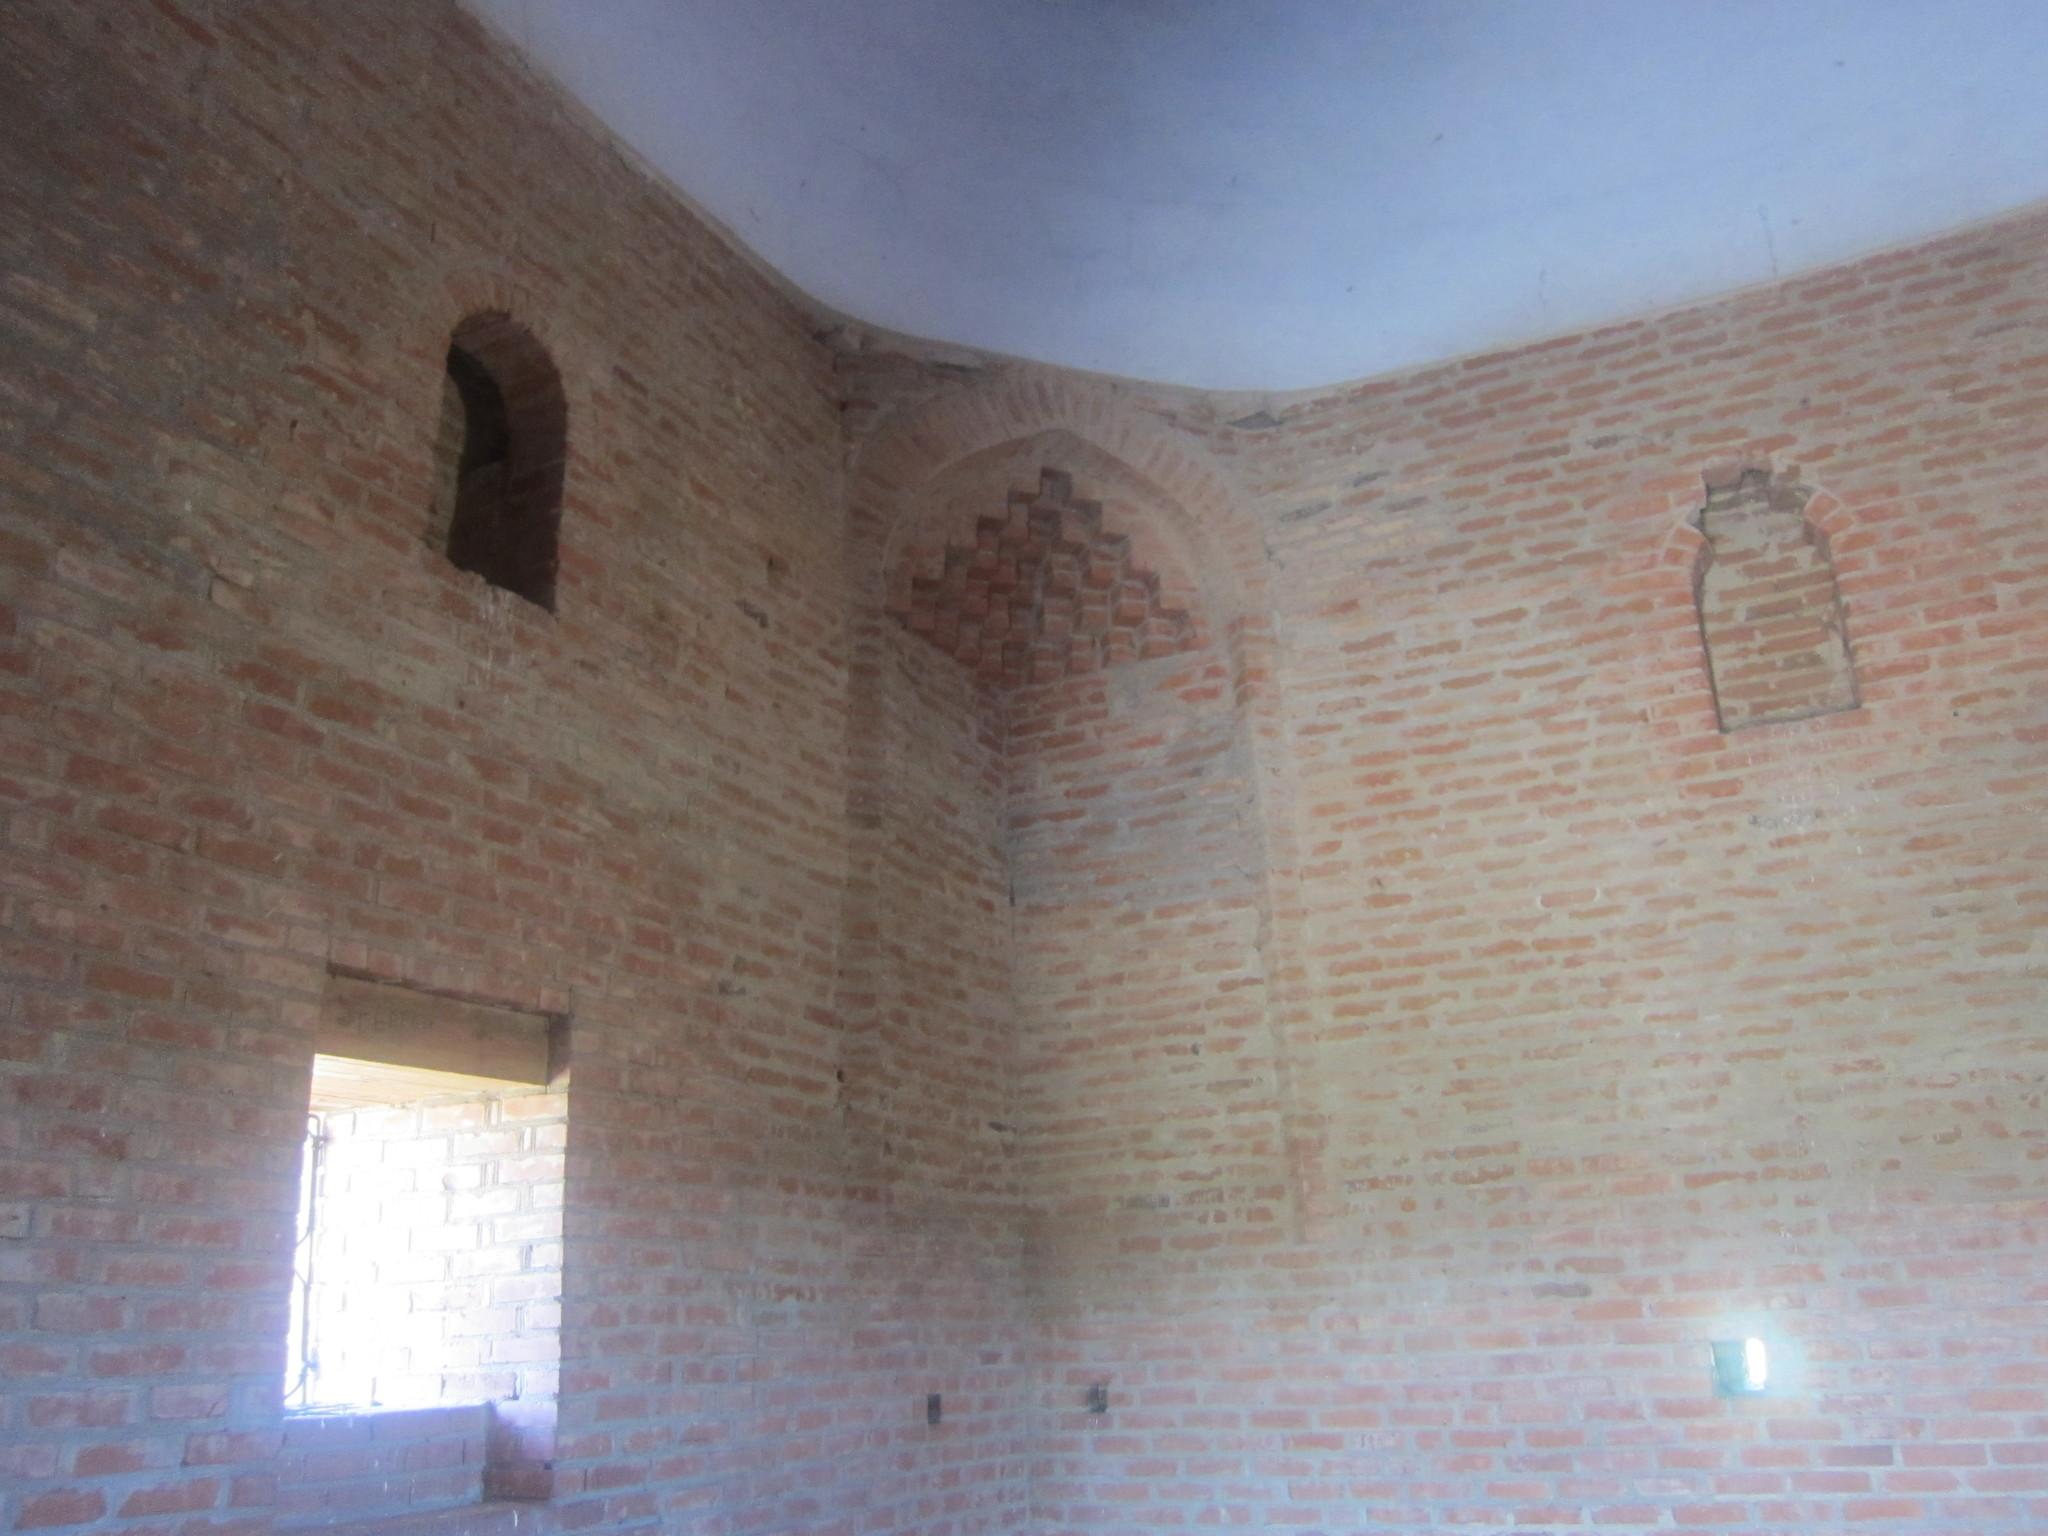 Вид внутри мавзолея (25.06.2013)